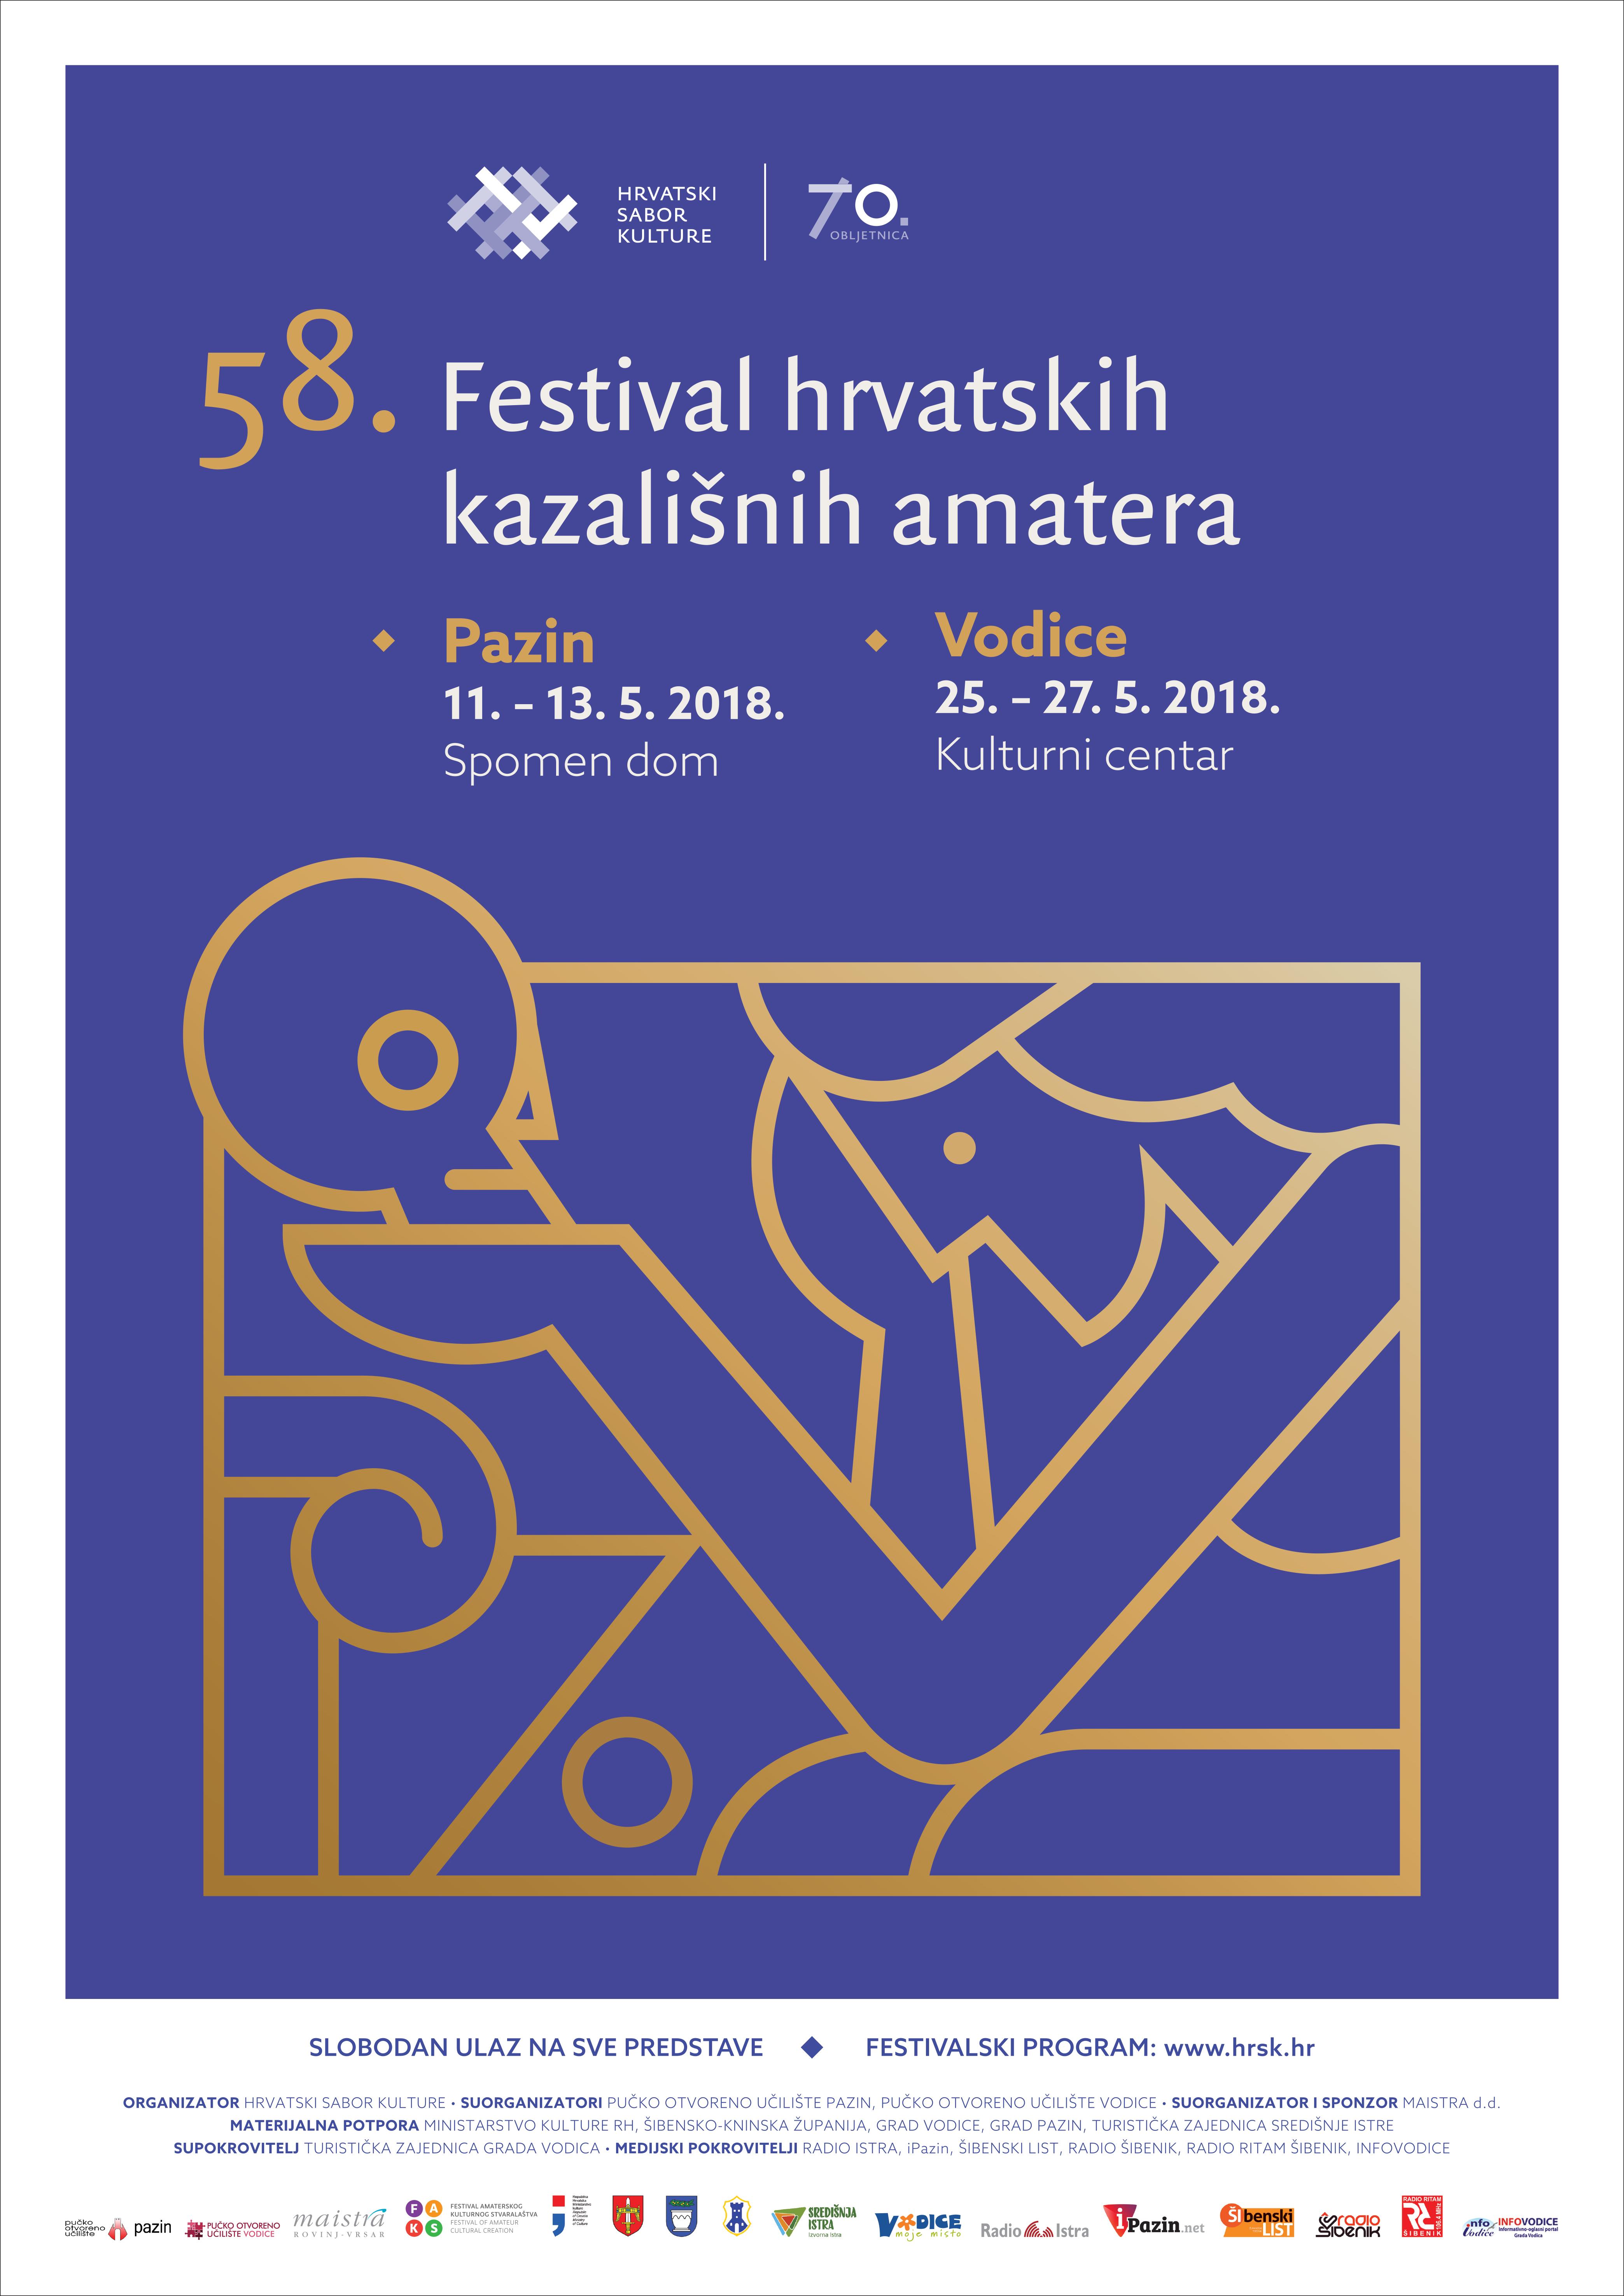 58. FESTIVAL HRVATSKIH KAZALIŠNIH AMATERA